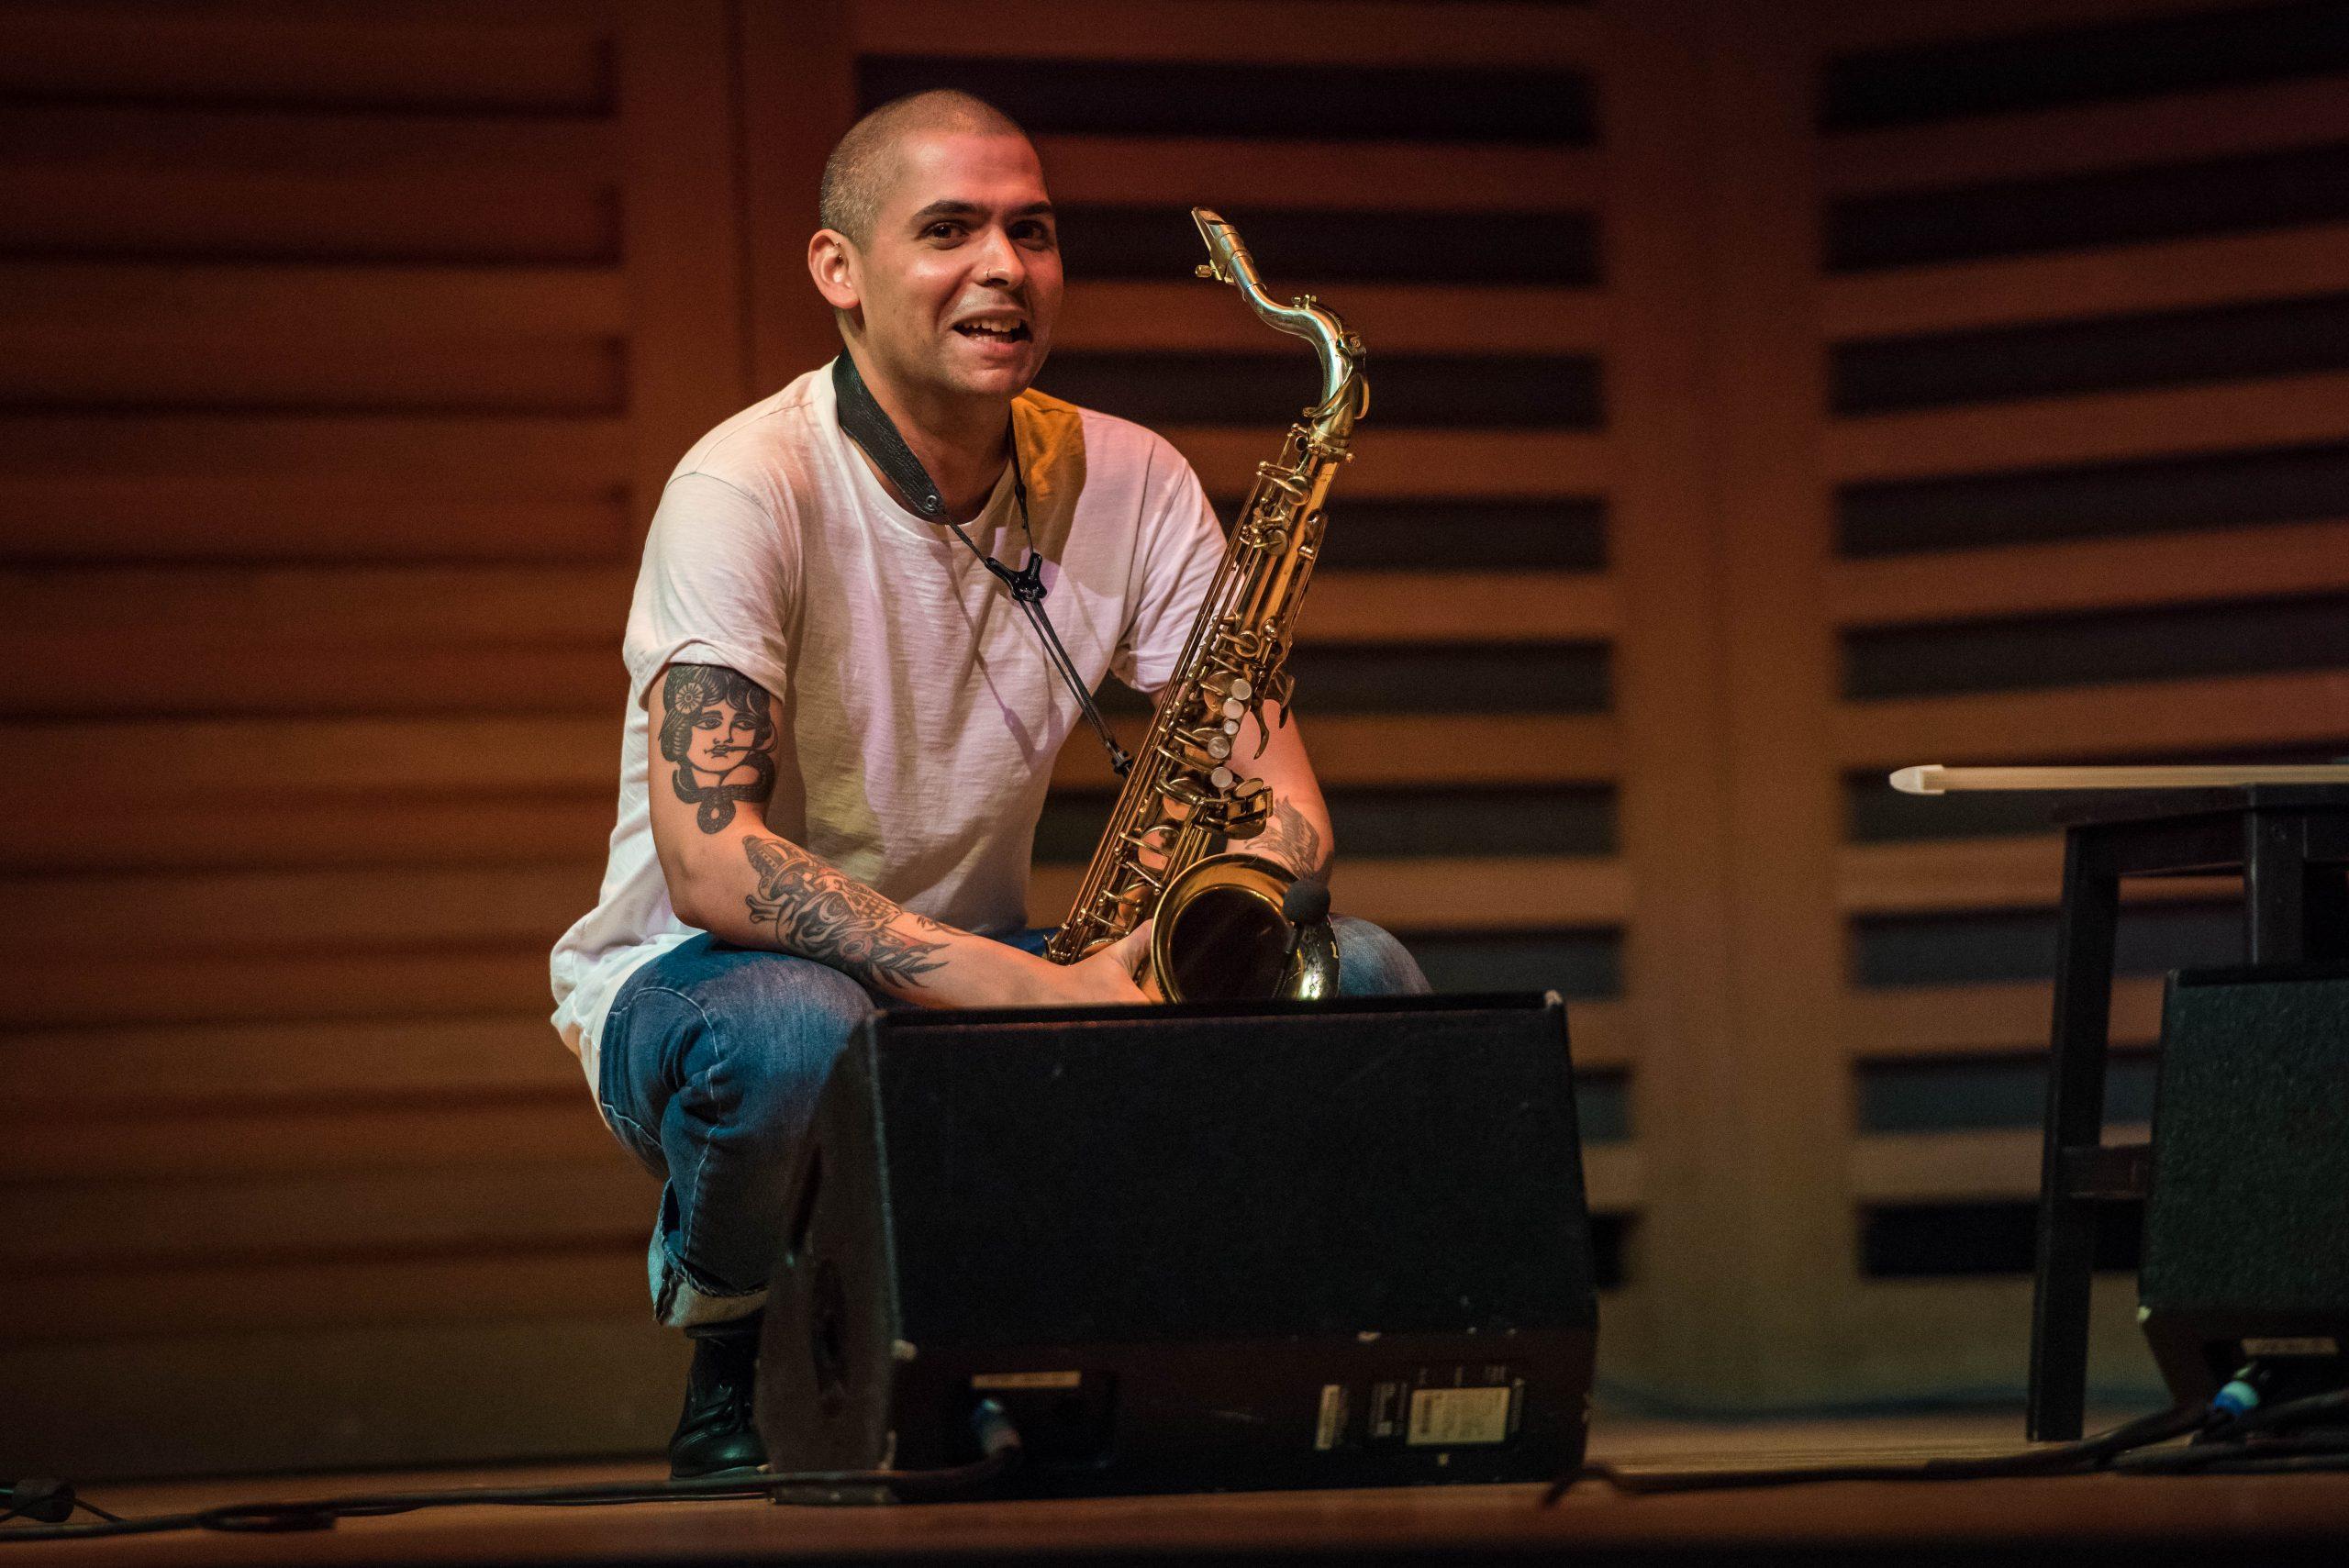 Live Review: Binker Golding, London Jazz Festival, King's Place – 21.11.20